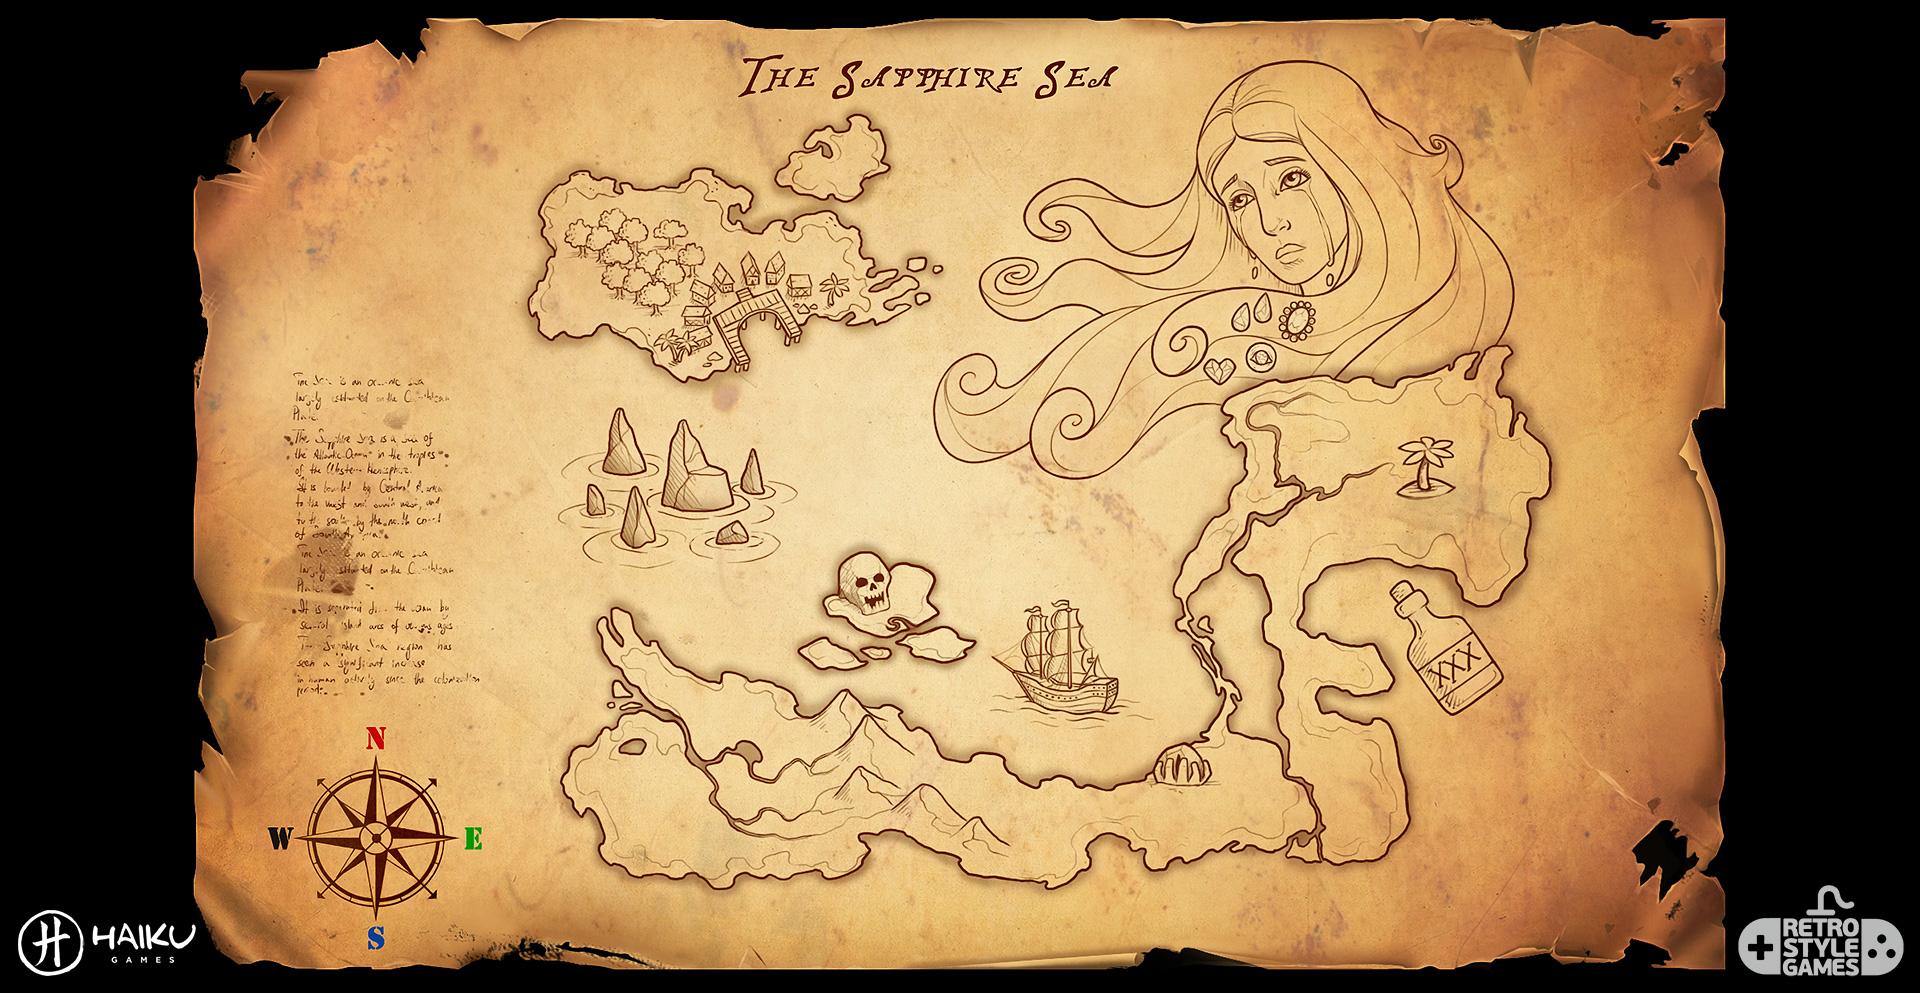 Haiku HOG 2D Background Pirate Treasure Map